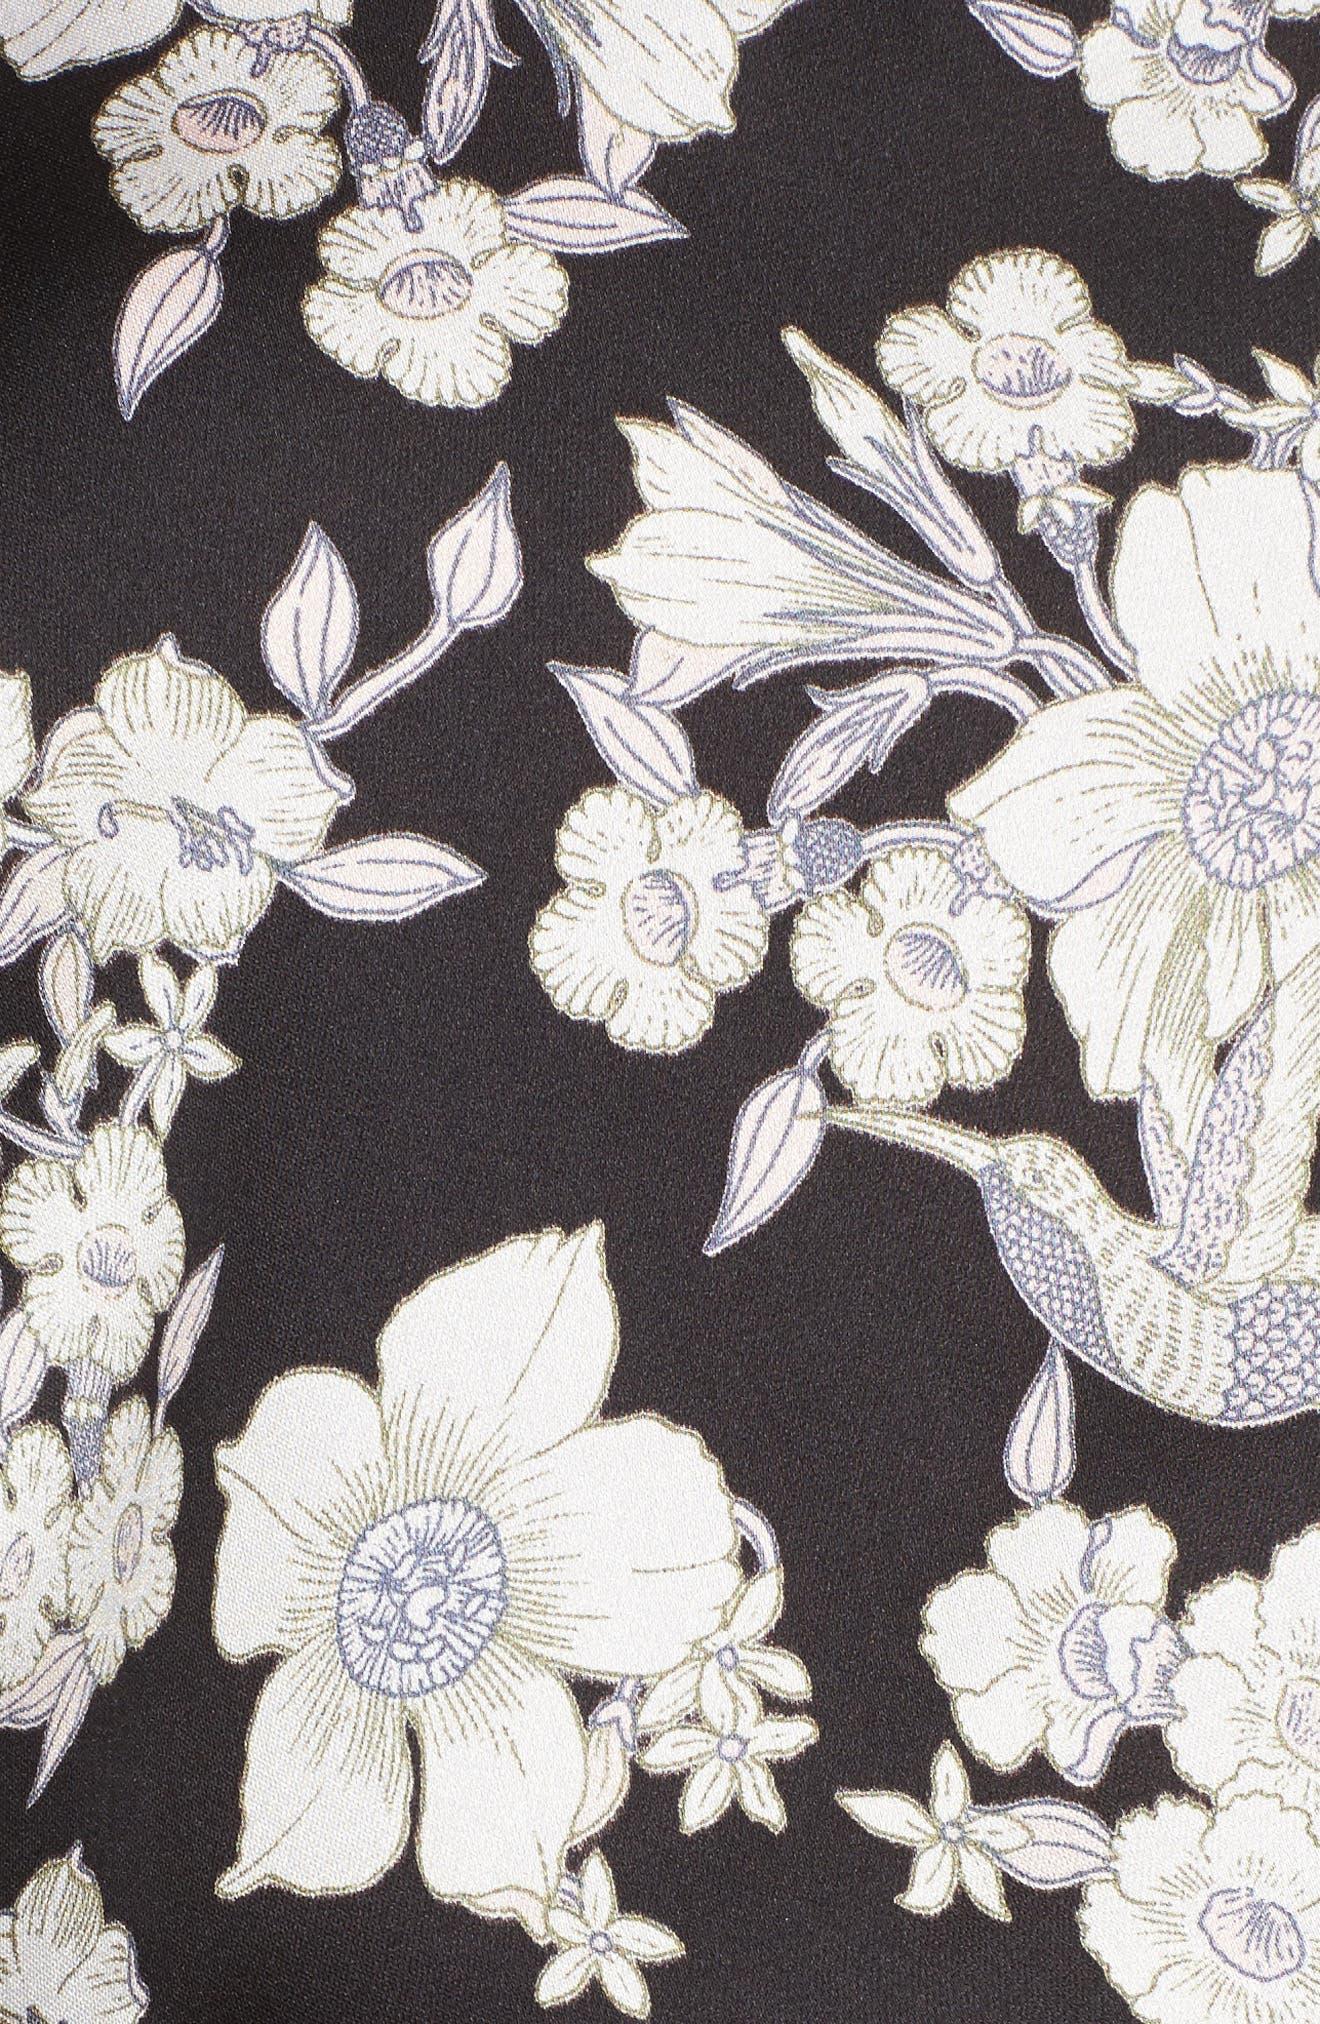 Birdee One Shoulder Crop Top,                             Alternate thumbnail 5, color,                             Black Floral